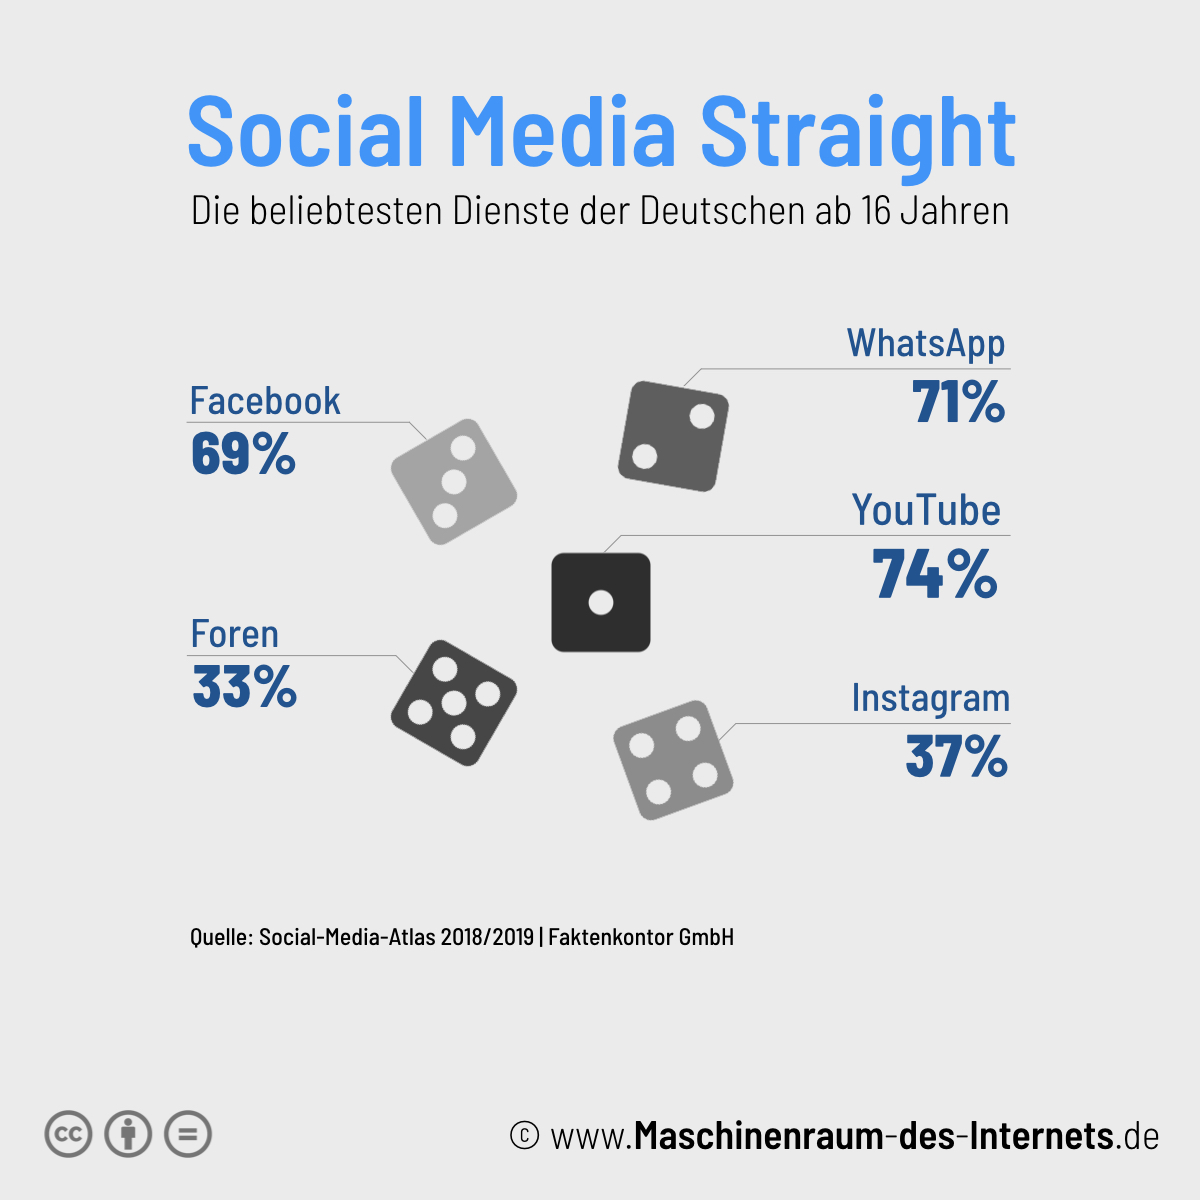 Maschinenraum des Internets ++ Kurzfakt: Social-Media-Atlas 2018/2019